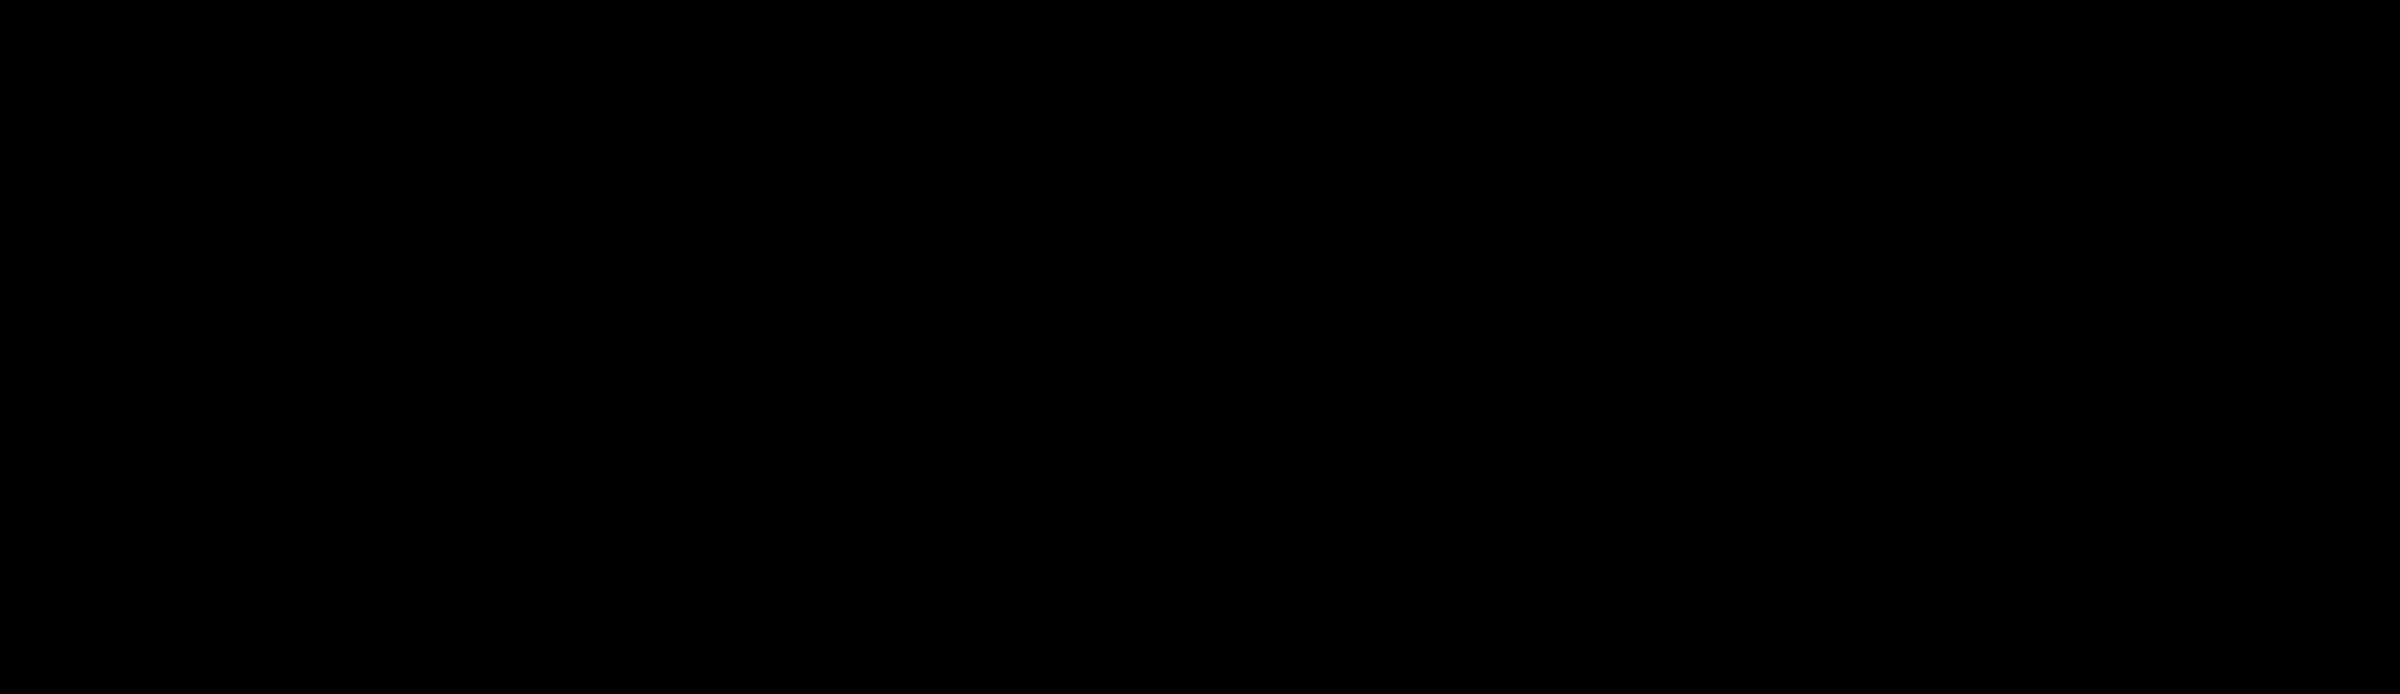 apple-itunes-logo-png-transparent.png